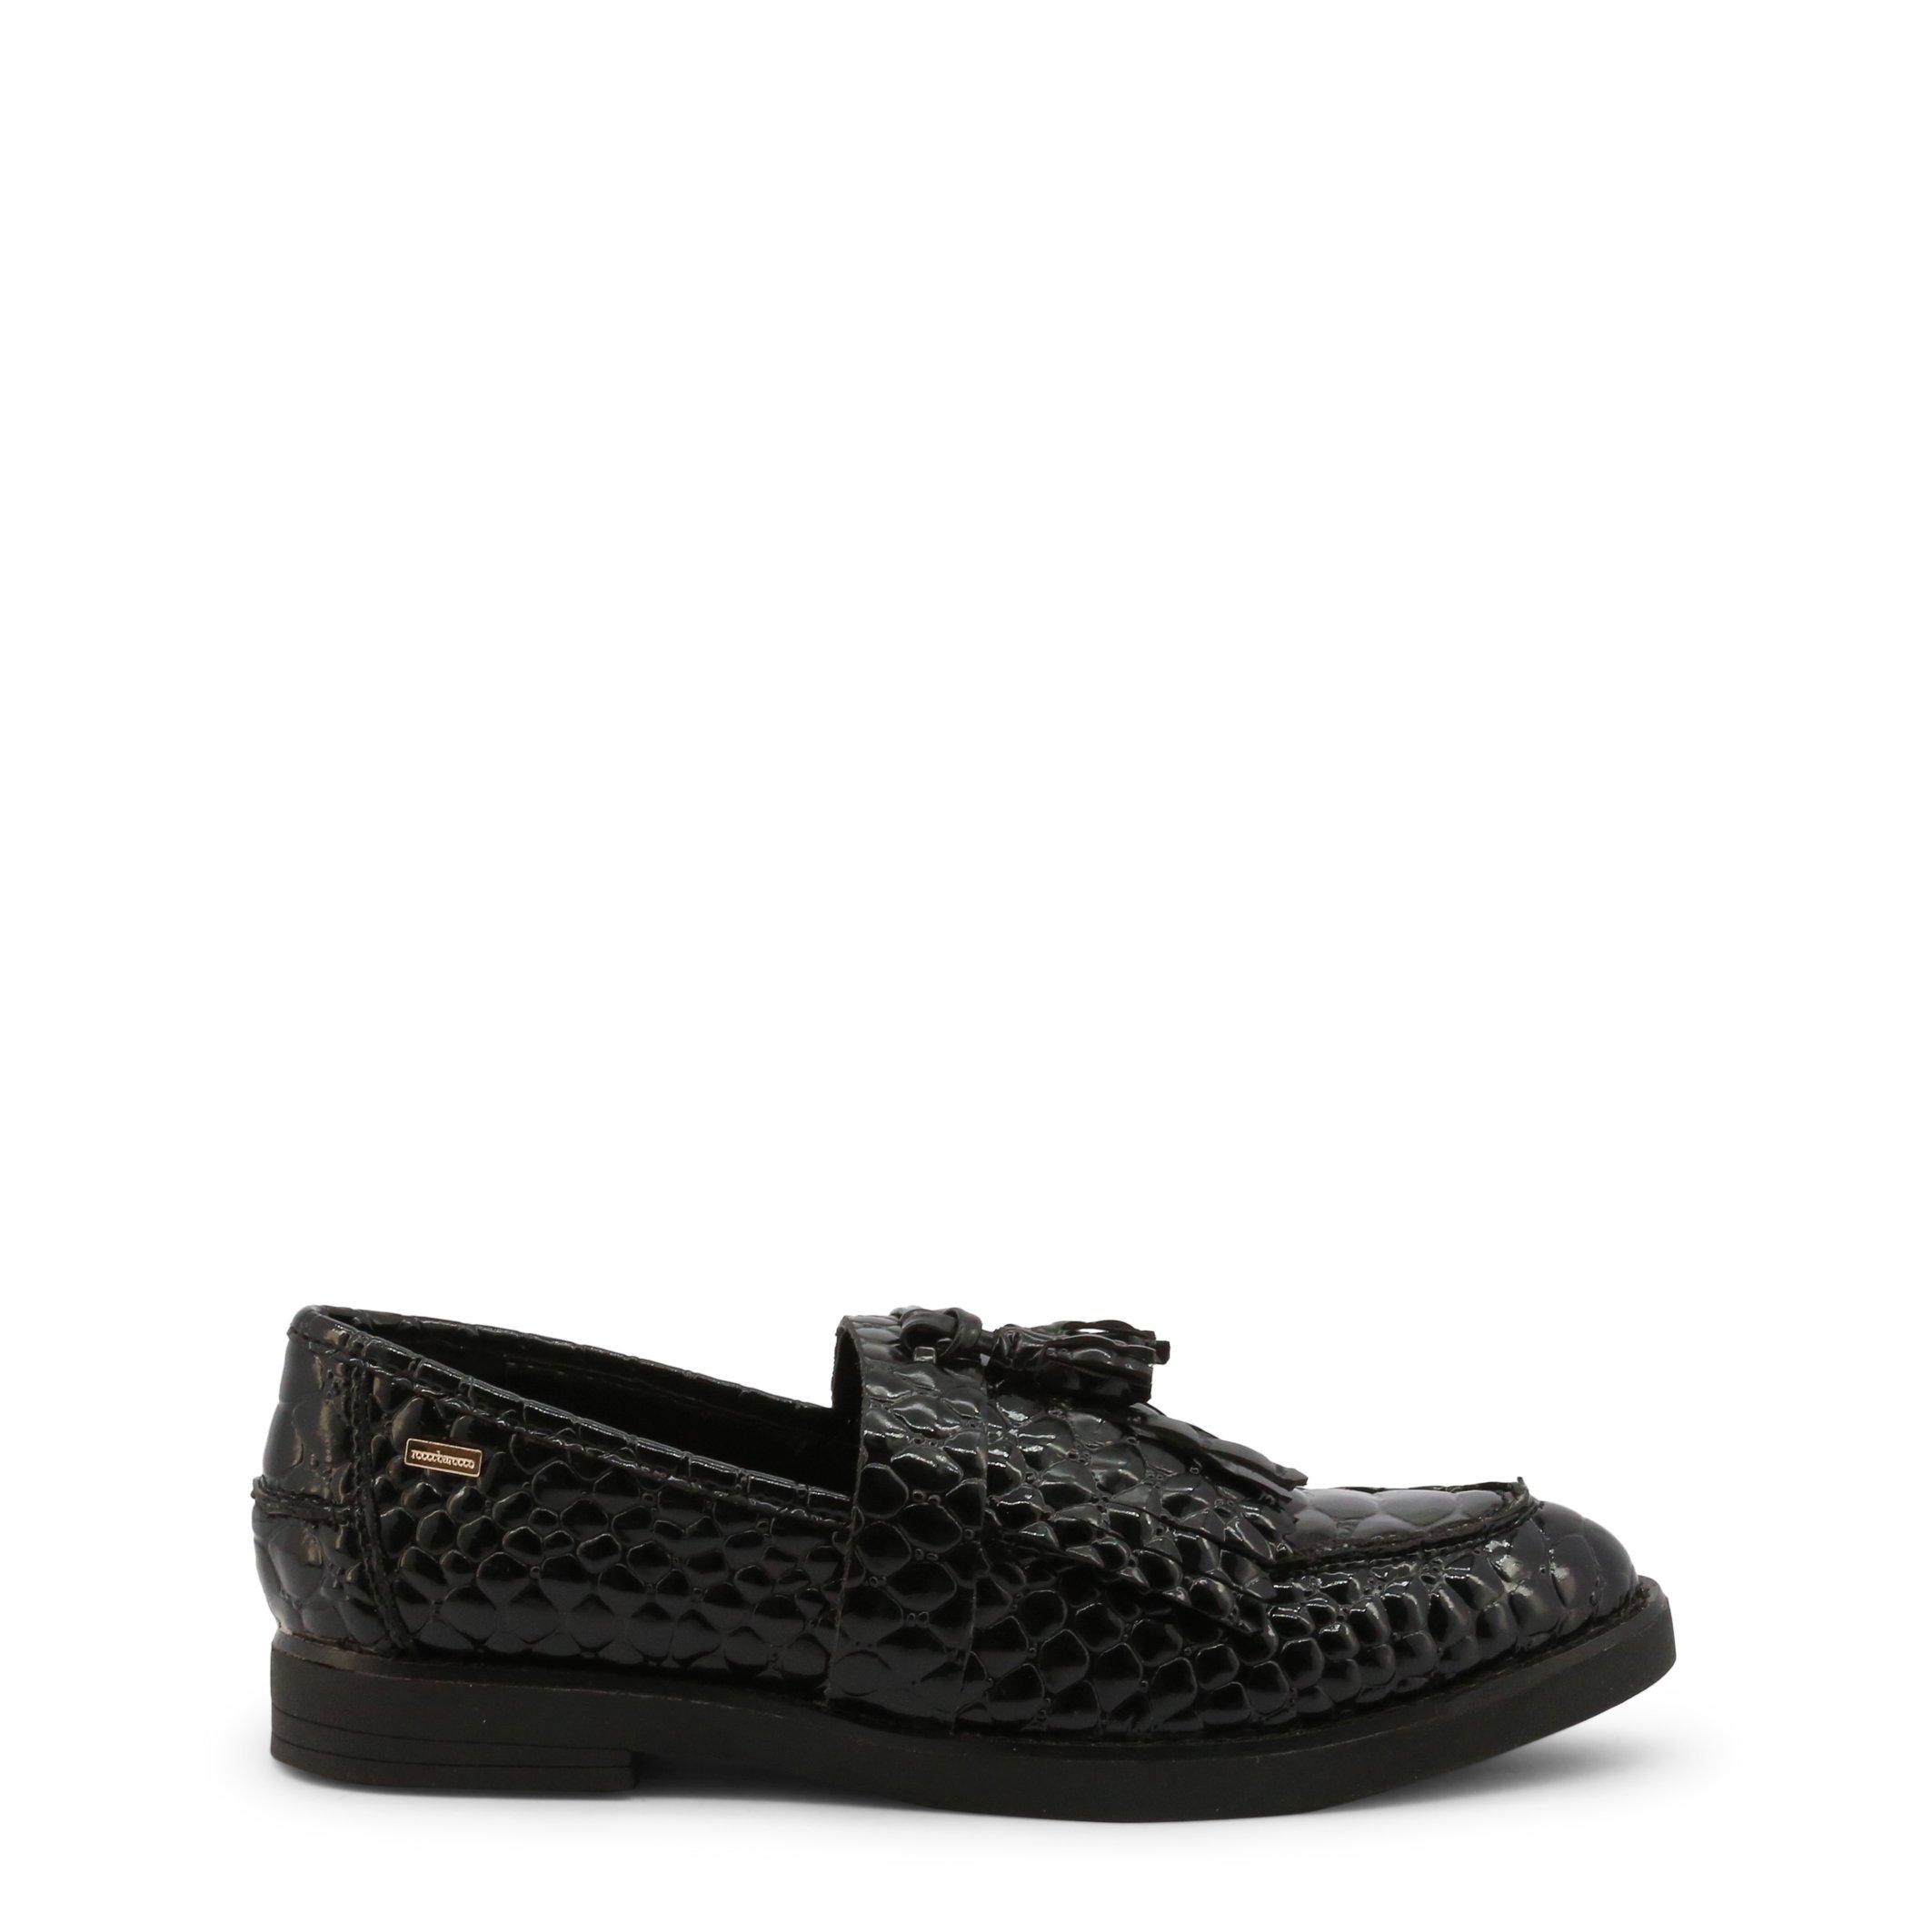 Roccobarocco Women's Loafer Green ROSC0X103PIT - black EU 39